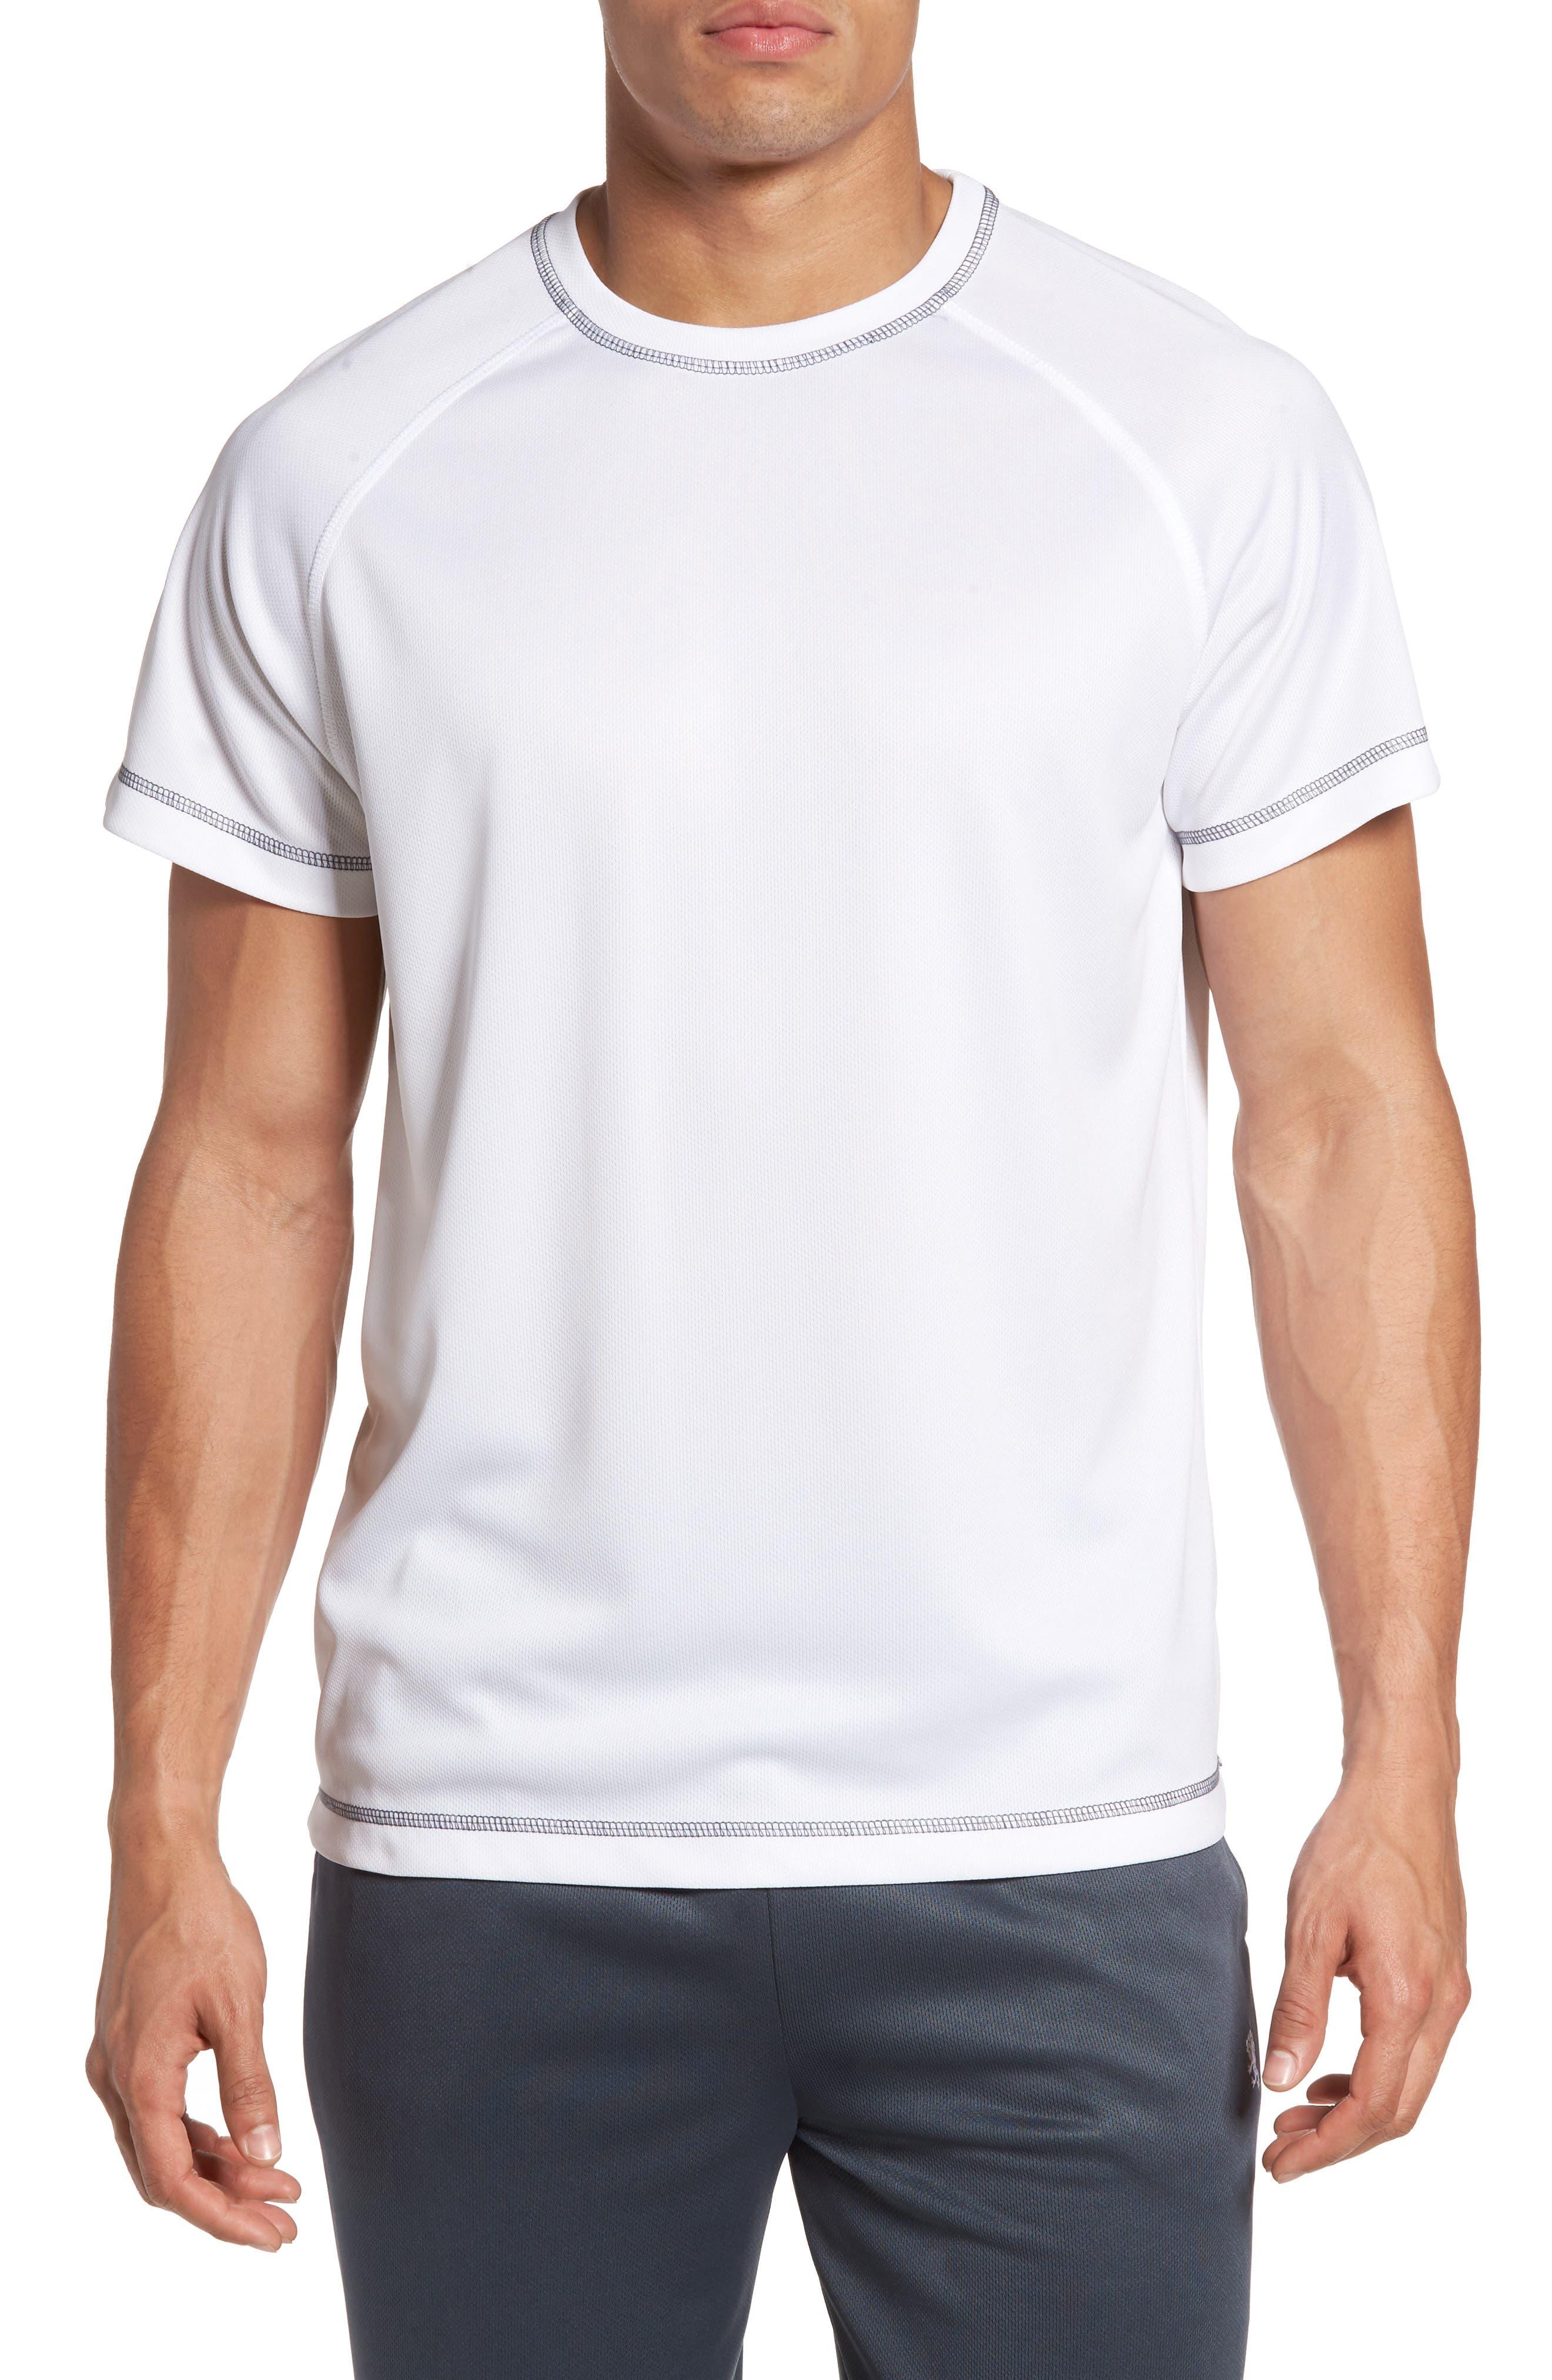 Majestic International Work Out Crewneck T-Shirt